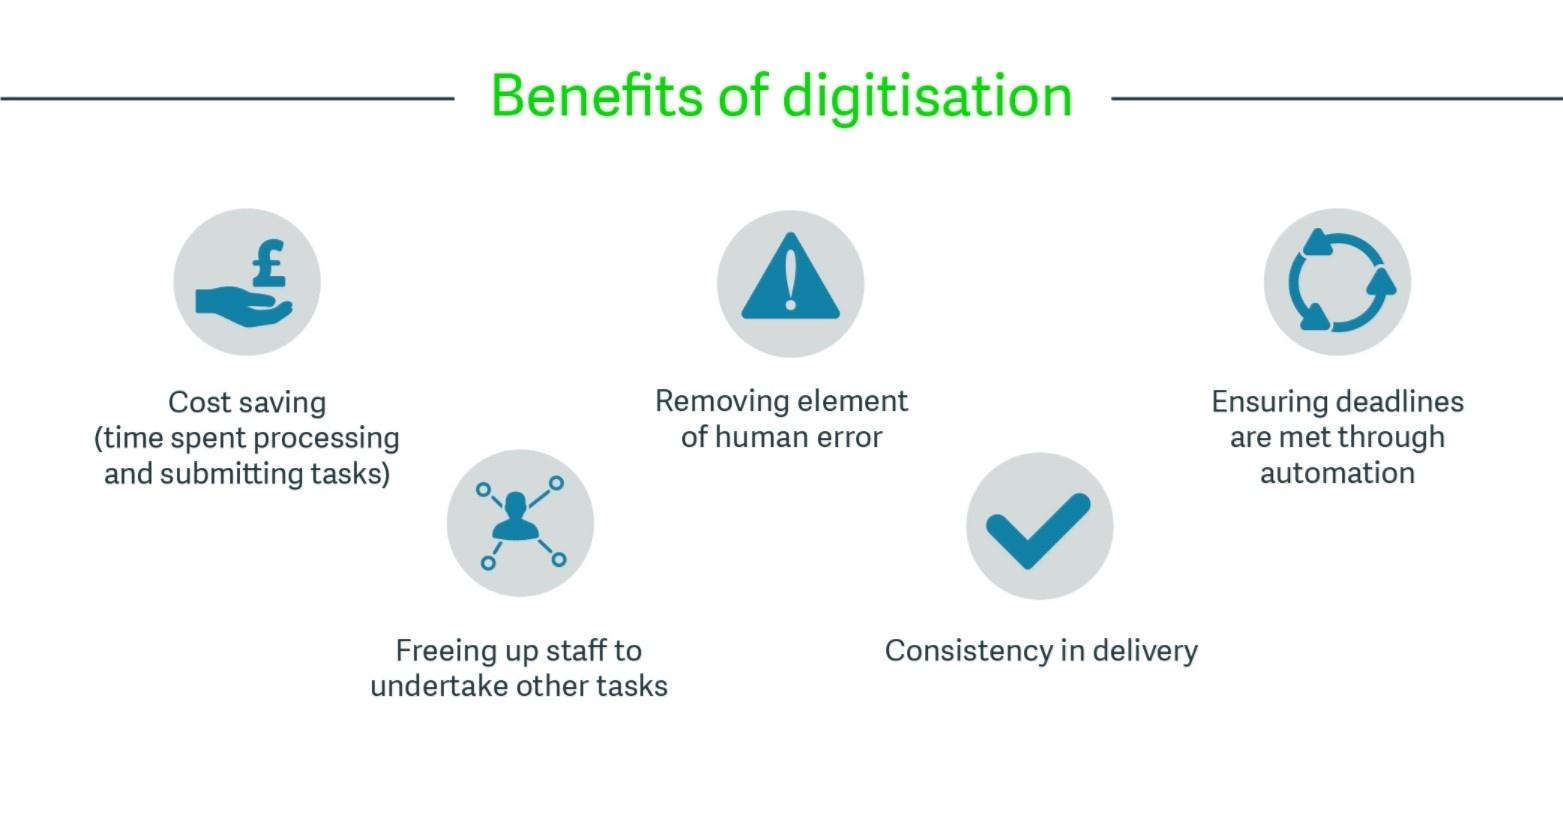 Benefits of digitisation